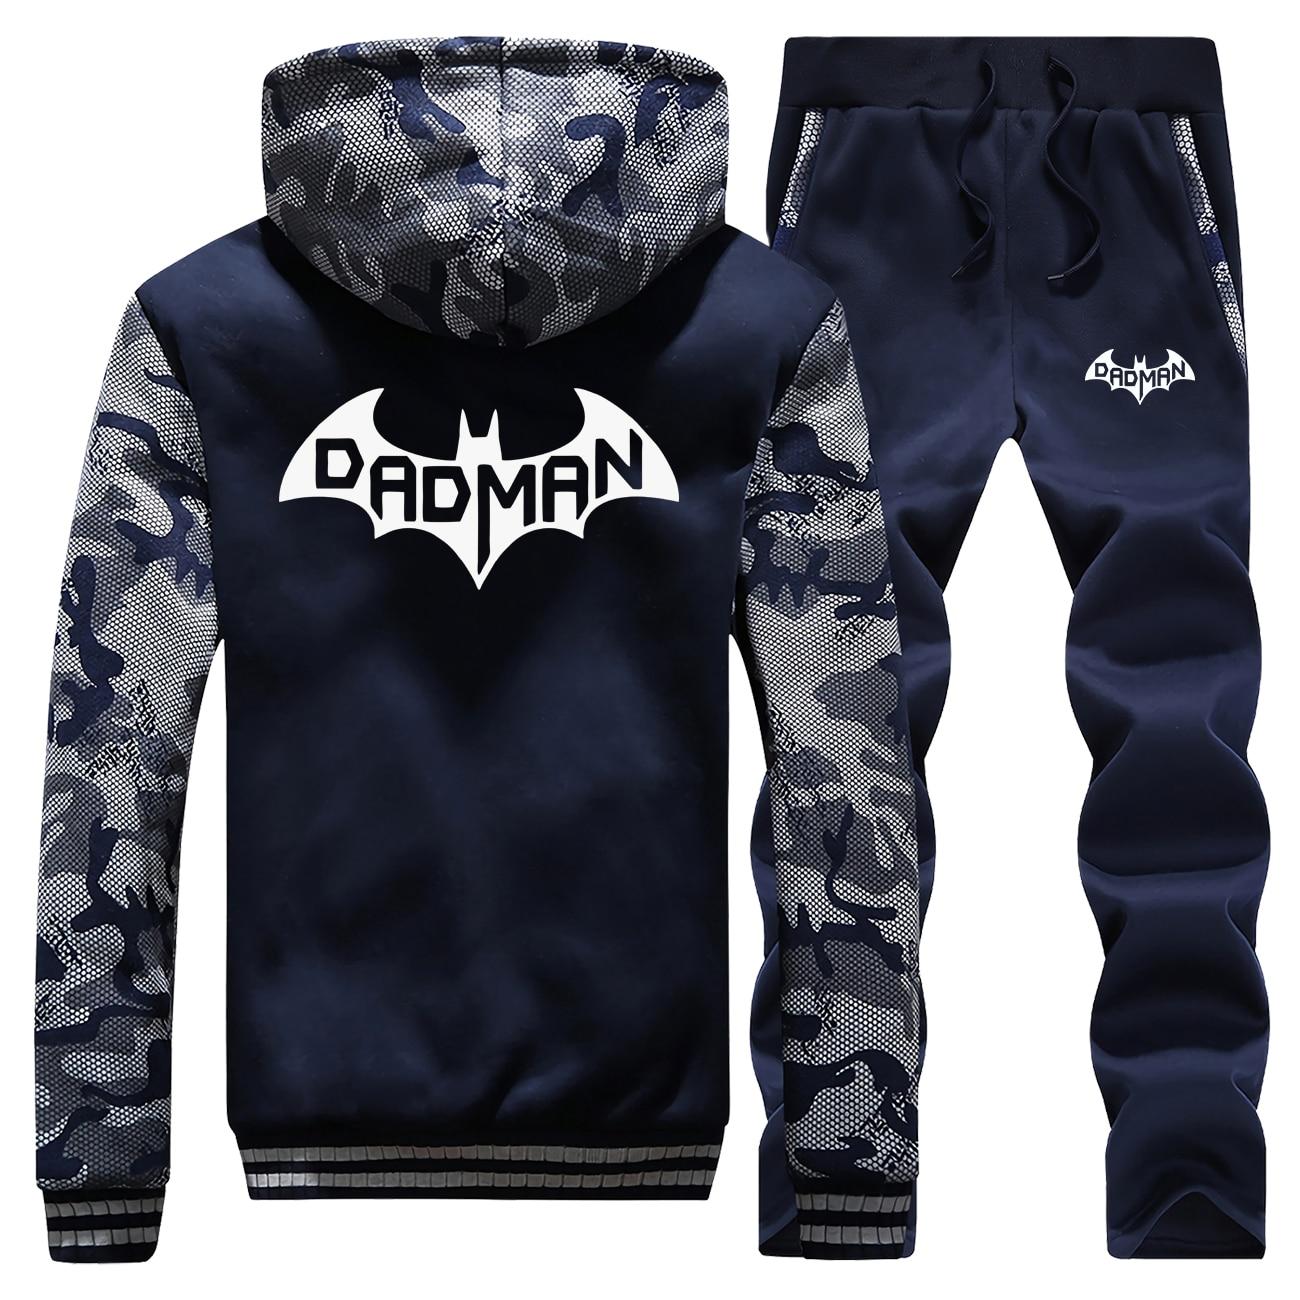 Badman Batman Tracksuits Jacket Pant Set Men  Superhero Sportsuits Sweatshirt Hoodies Sweatpant Suit 2 PCS Camo Coat Sportswear